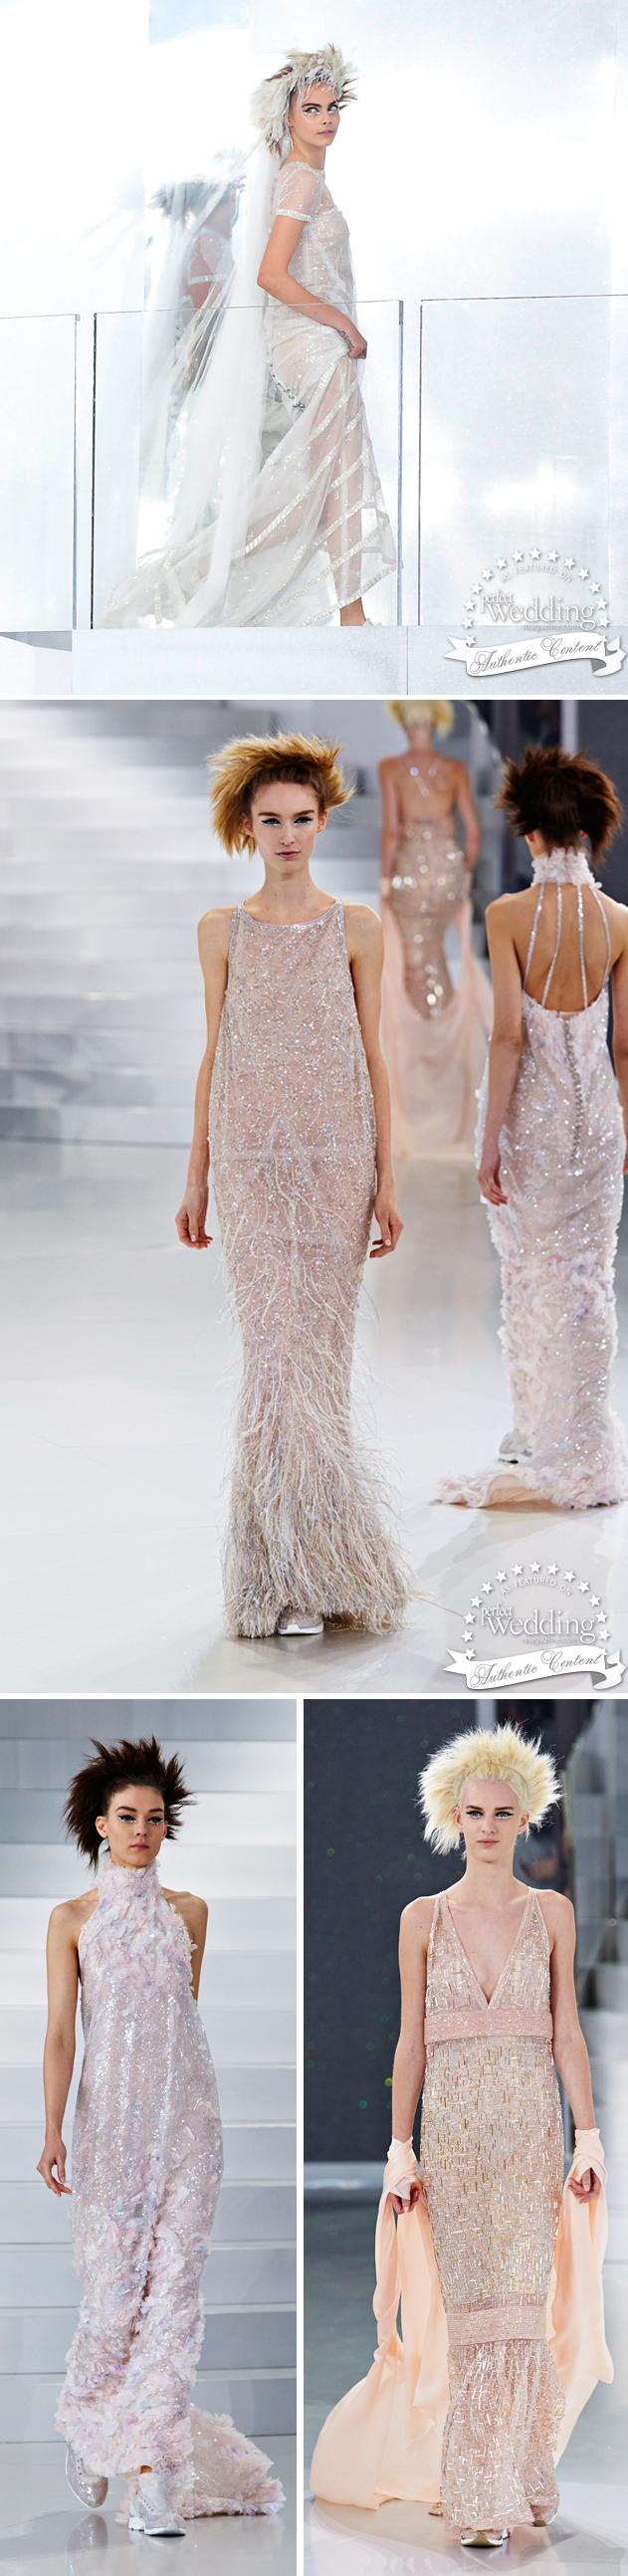 Chanel Spring Summer 2014 Haute Couture, Perfect Wedding magazine, Chanel Bride